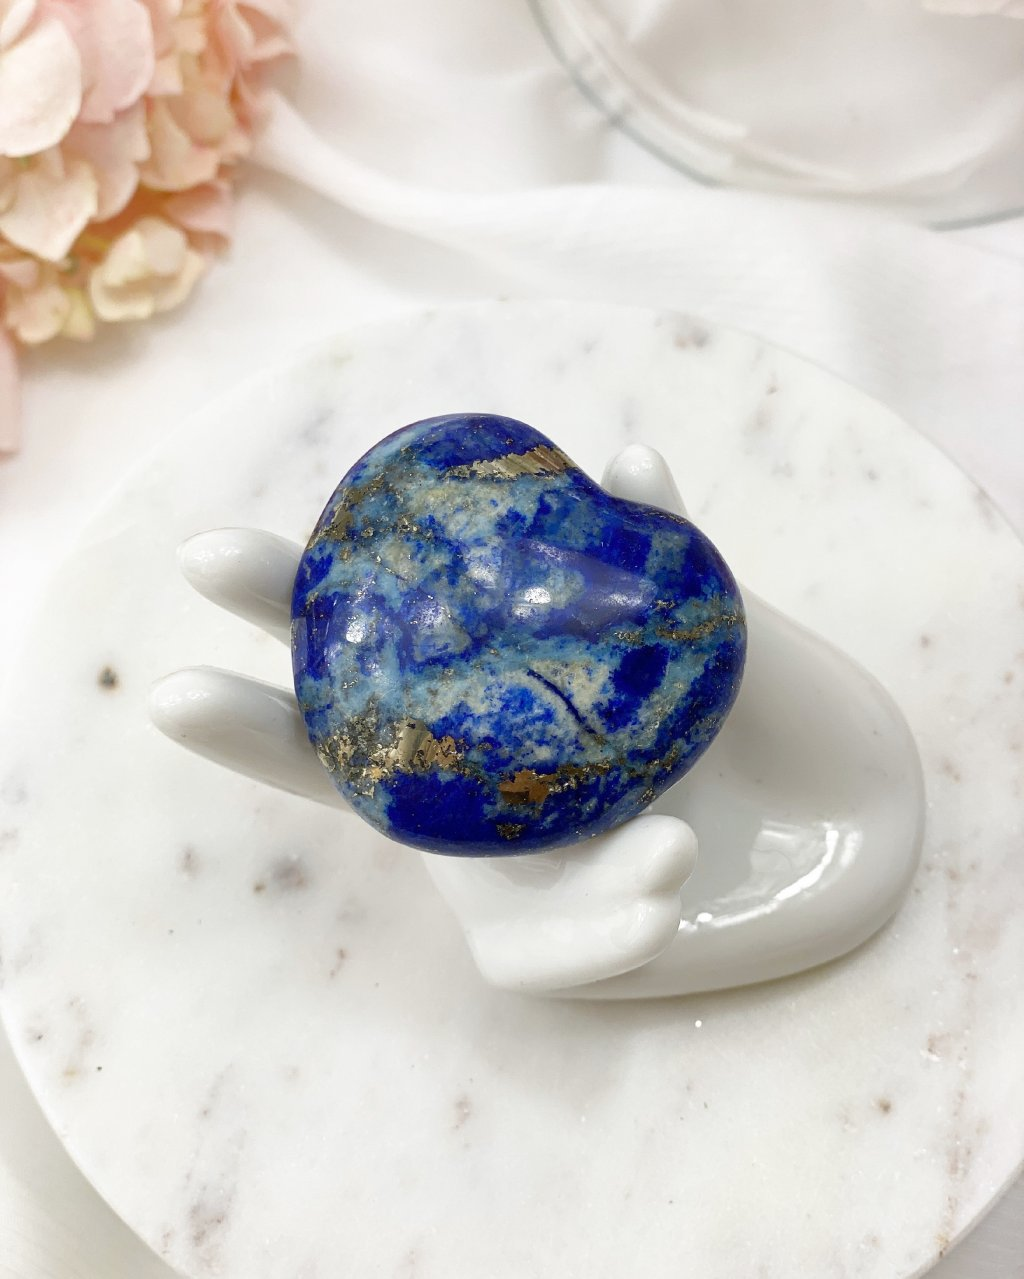 Lapis lazuli broušené srdce 4cm Afganistan